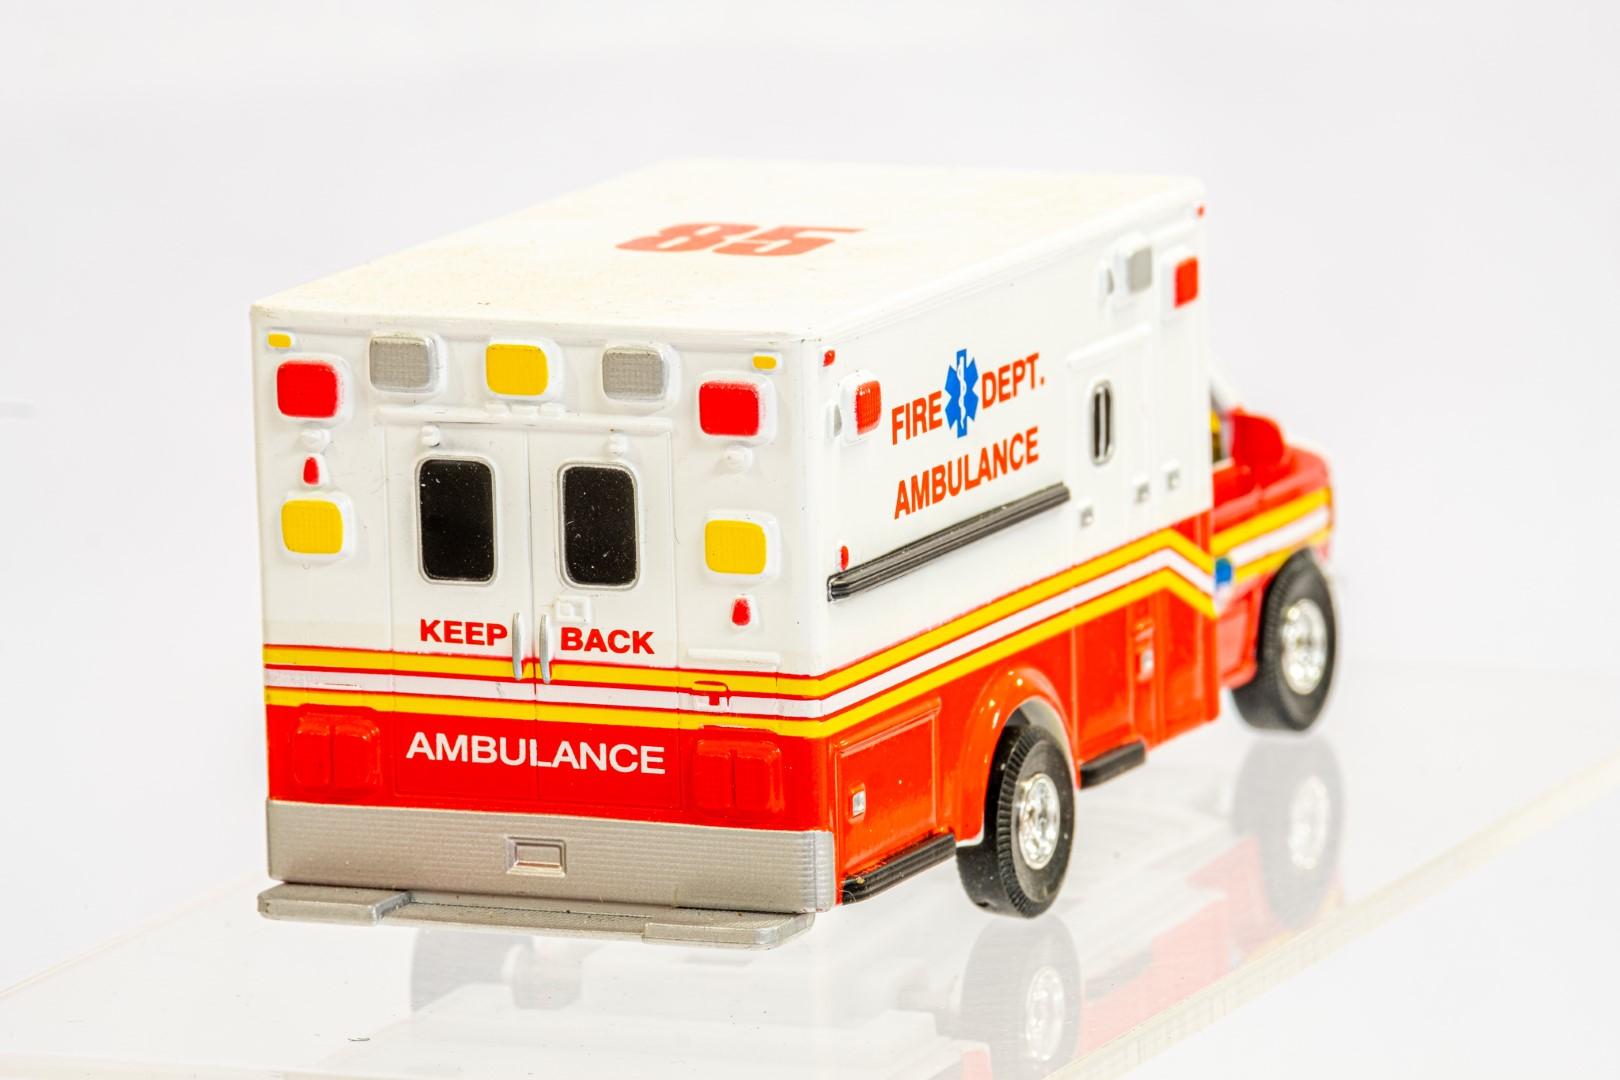 4 x Assorted Ambulance - Image 5 of 9